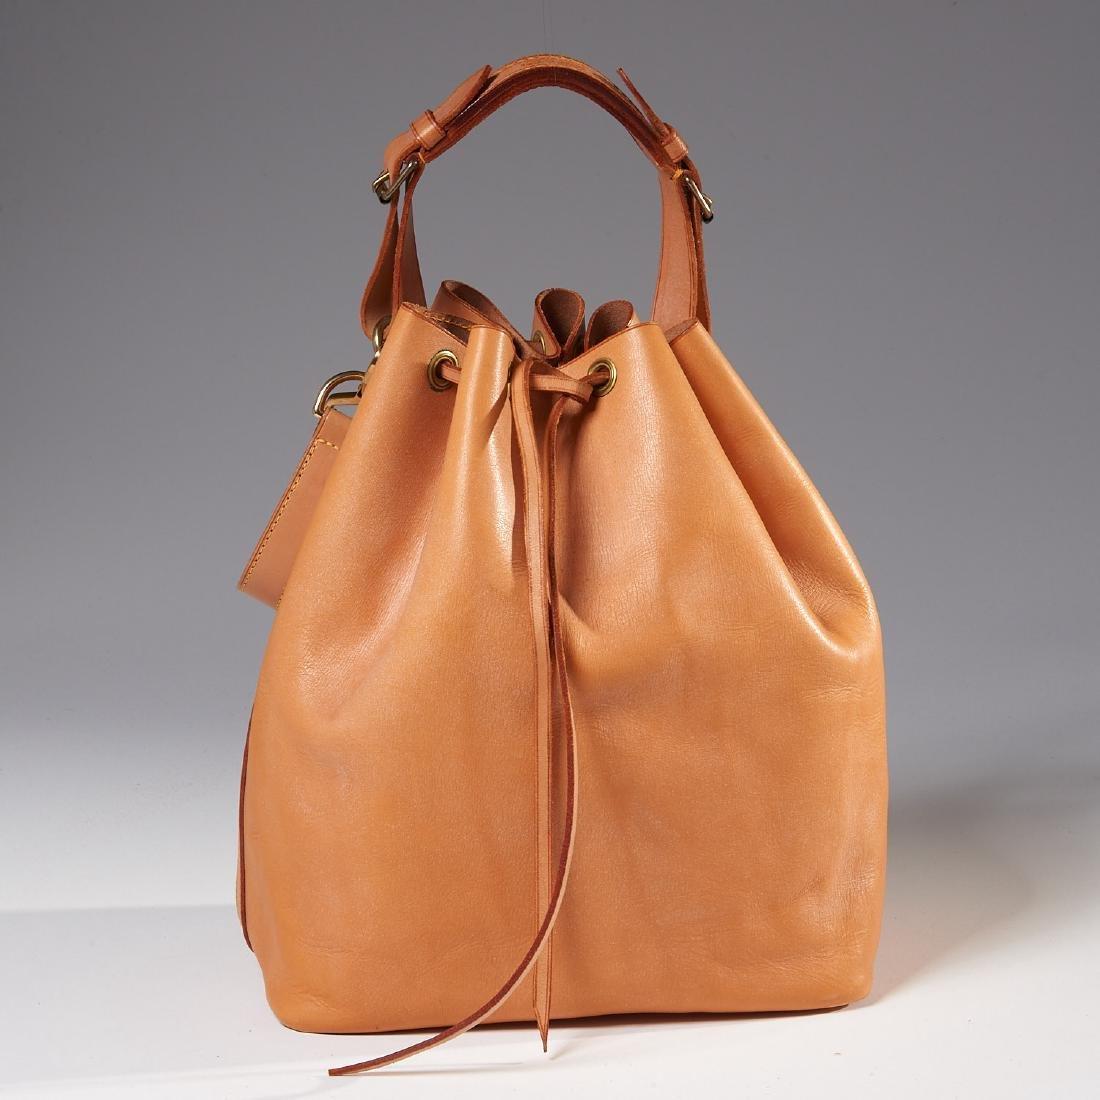 Louis Vuitton all leather drawstring handbag